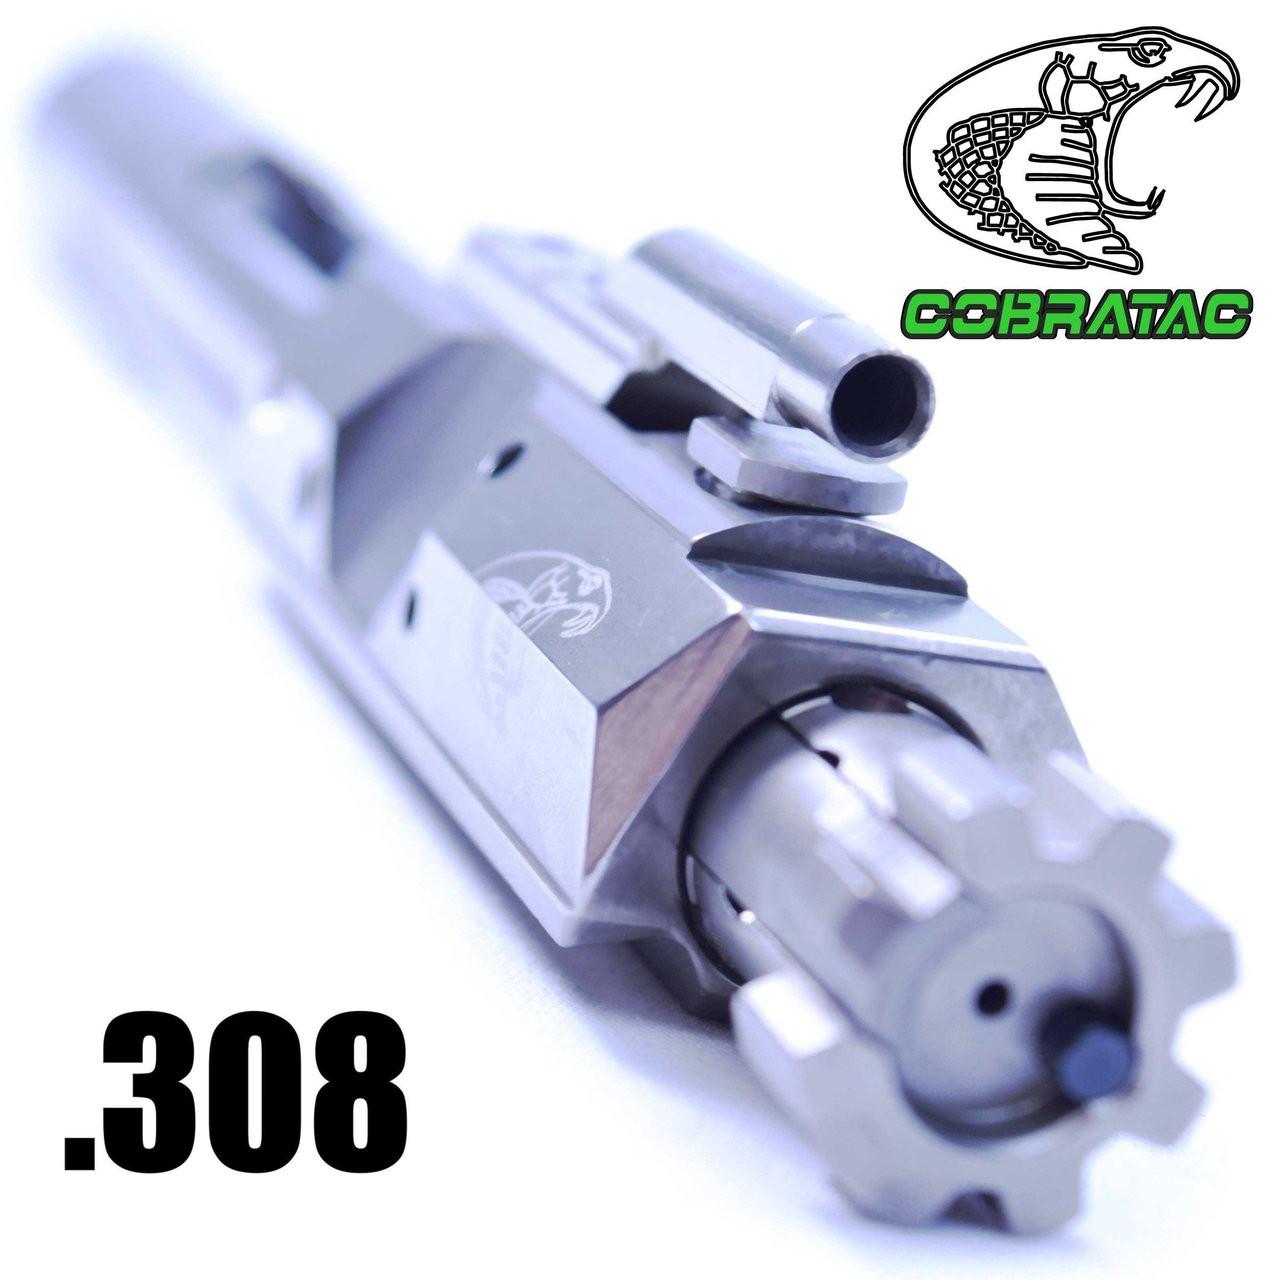 Cobratac Ultra Match .308 BCG LR-308 Bolt Carrier Group | EXO Nickle Boron